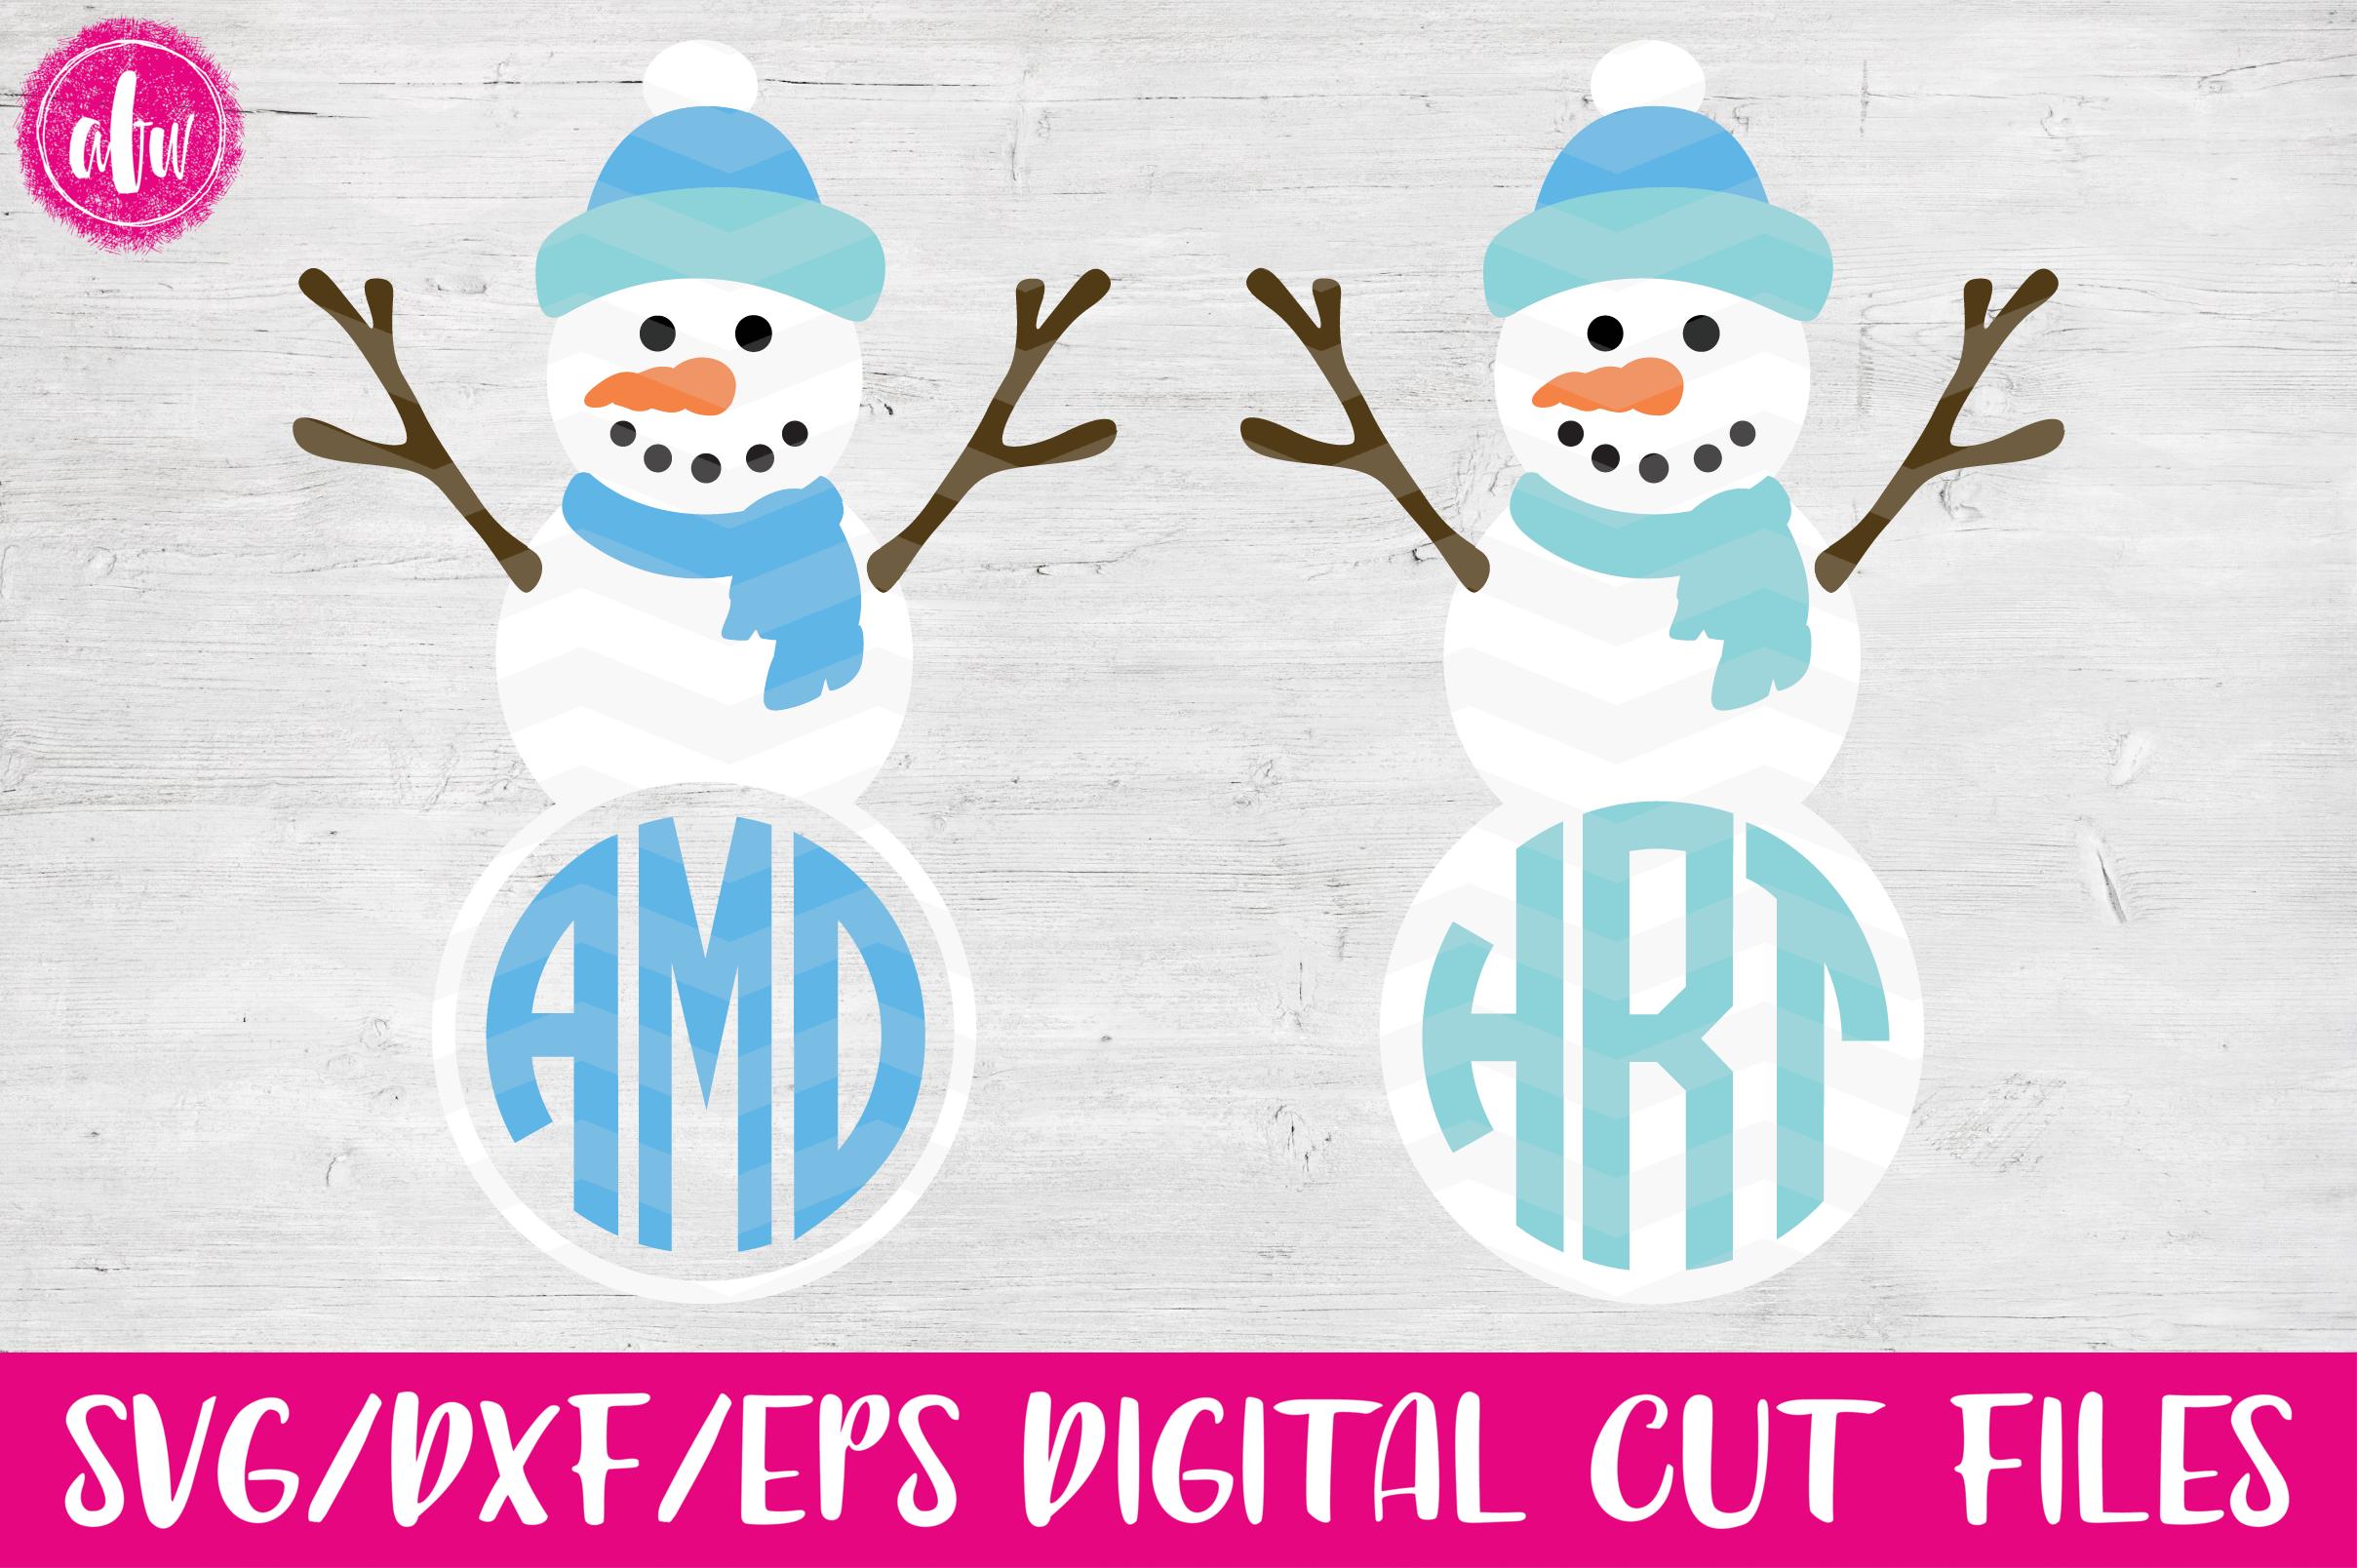 Monogram Snowman - SVG, DXF, EPS Cut File example image 1